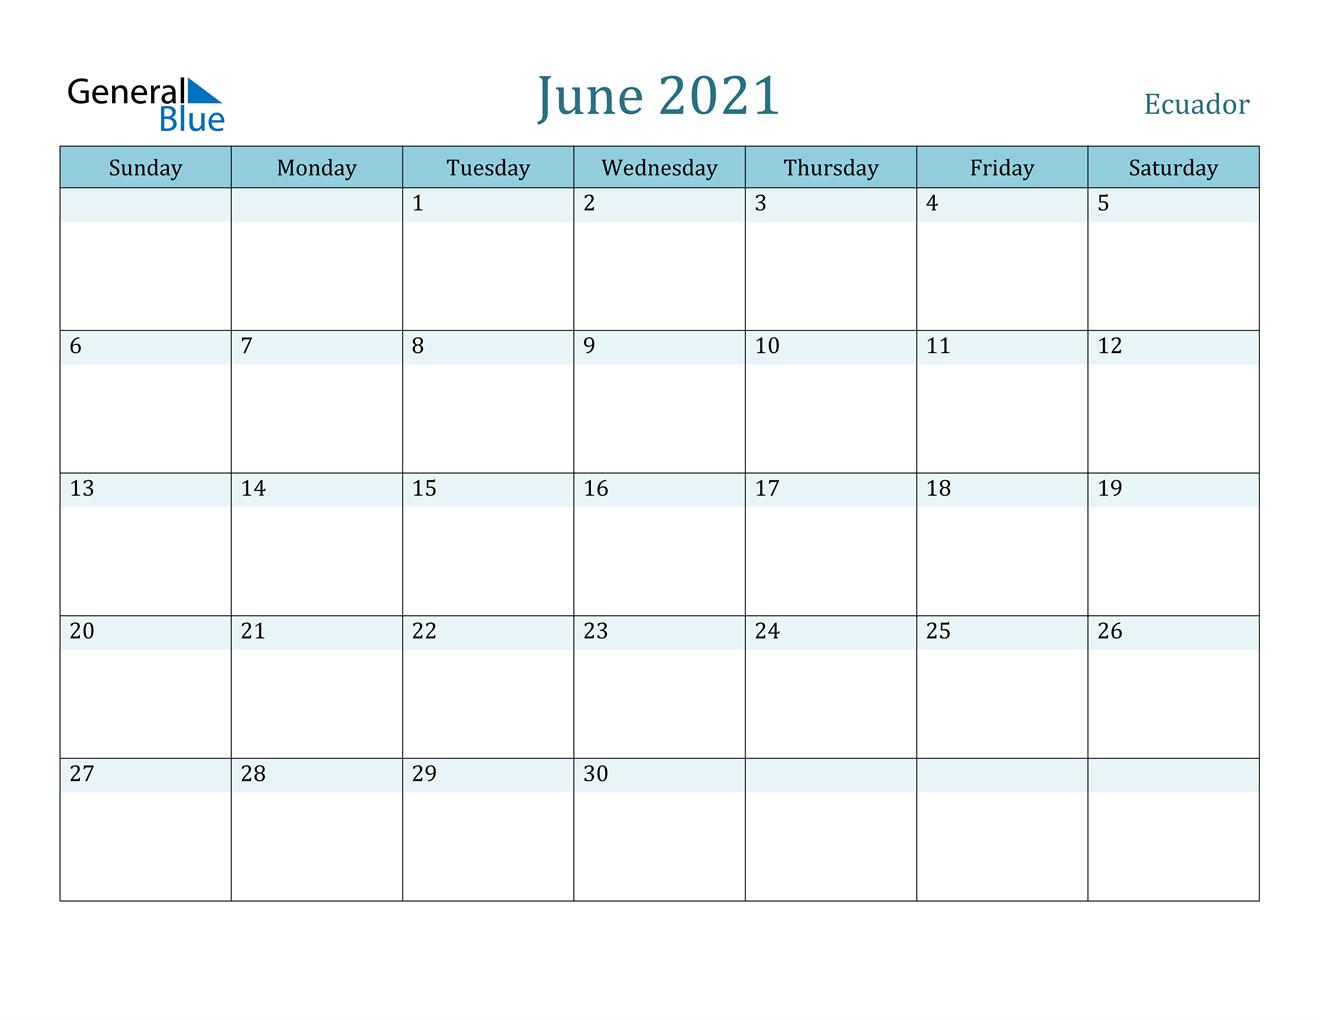 June 2021 Calendar - Ecuador